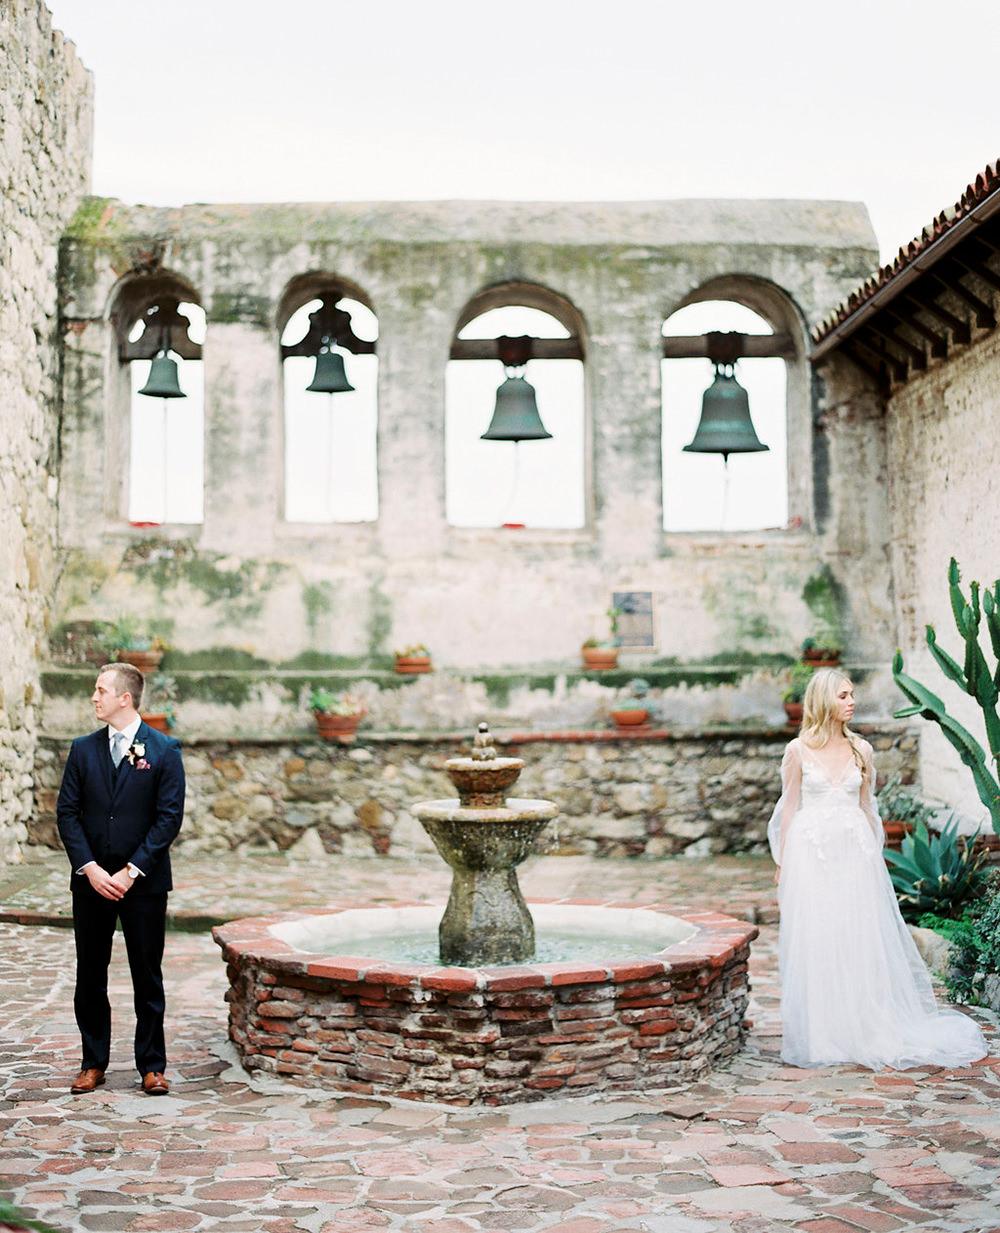 Relaxed San Juan Capistrano Wedding Inspiration - photo by Amanda Lenhardt https://ruffledblog.com/relaxed-san-juan-capistrano-wedding-inspiration